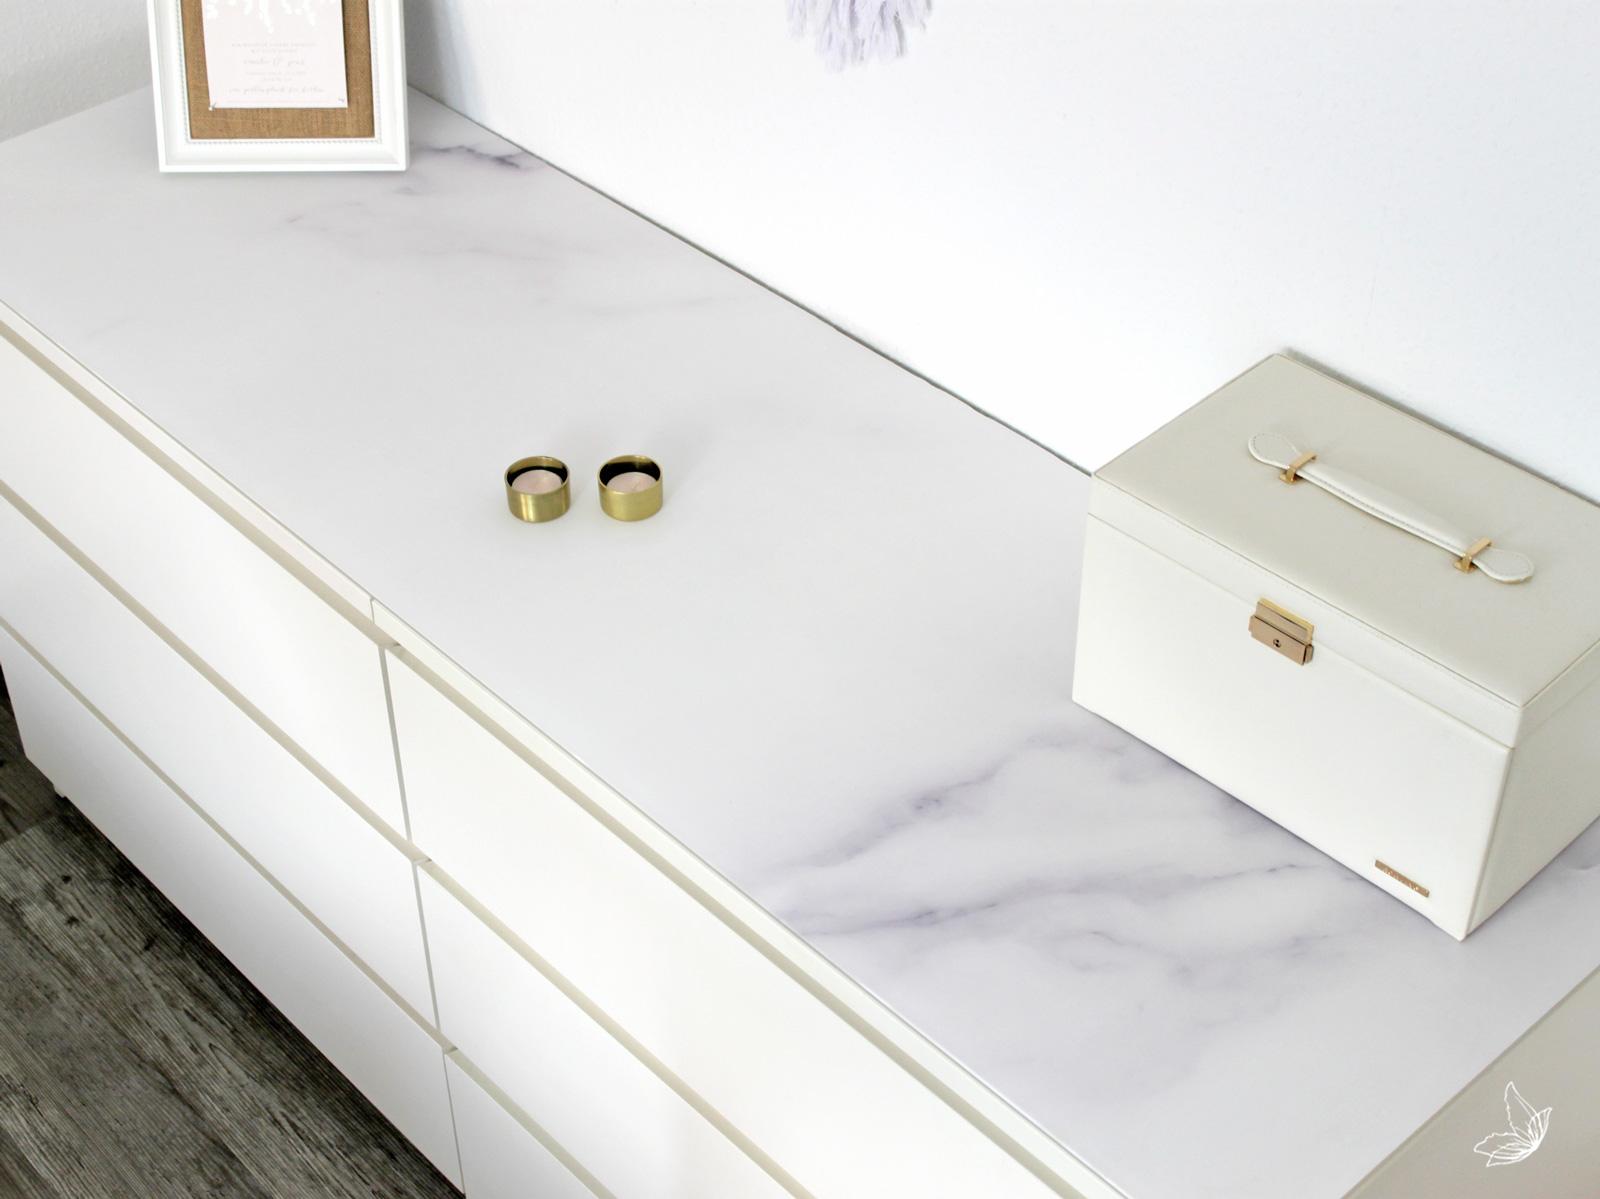 folie zum bekleben von mbeln kche mbel folie with folie. Black Bedroom Furniture Sets. Home Design Ideas